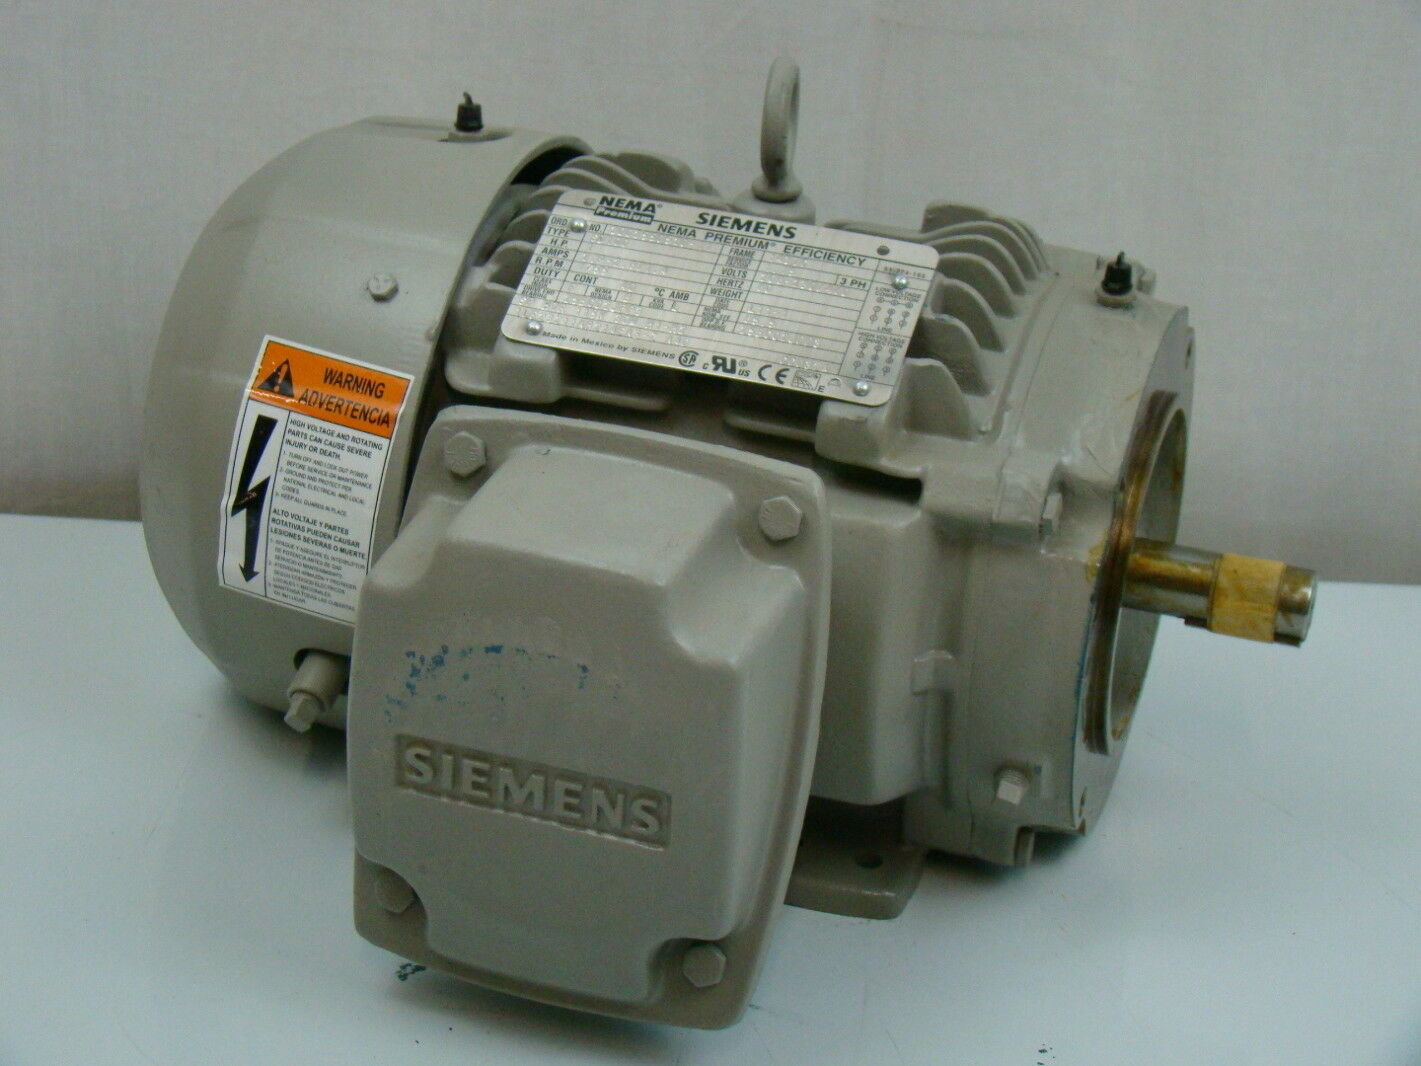 Siemens 1 Hp 1755 Rpm Electric Motor Sd100 Joseph Fazzio